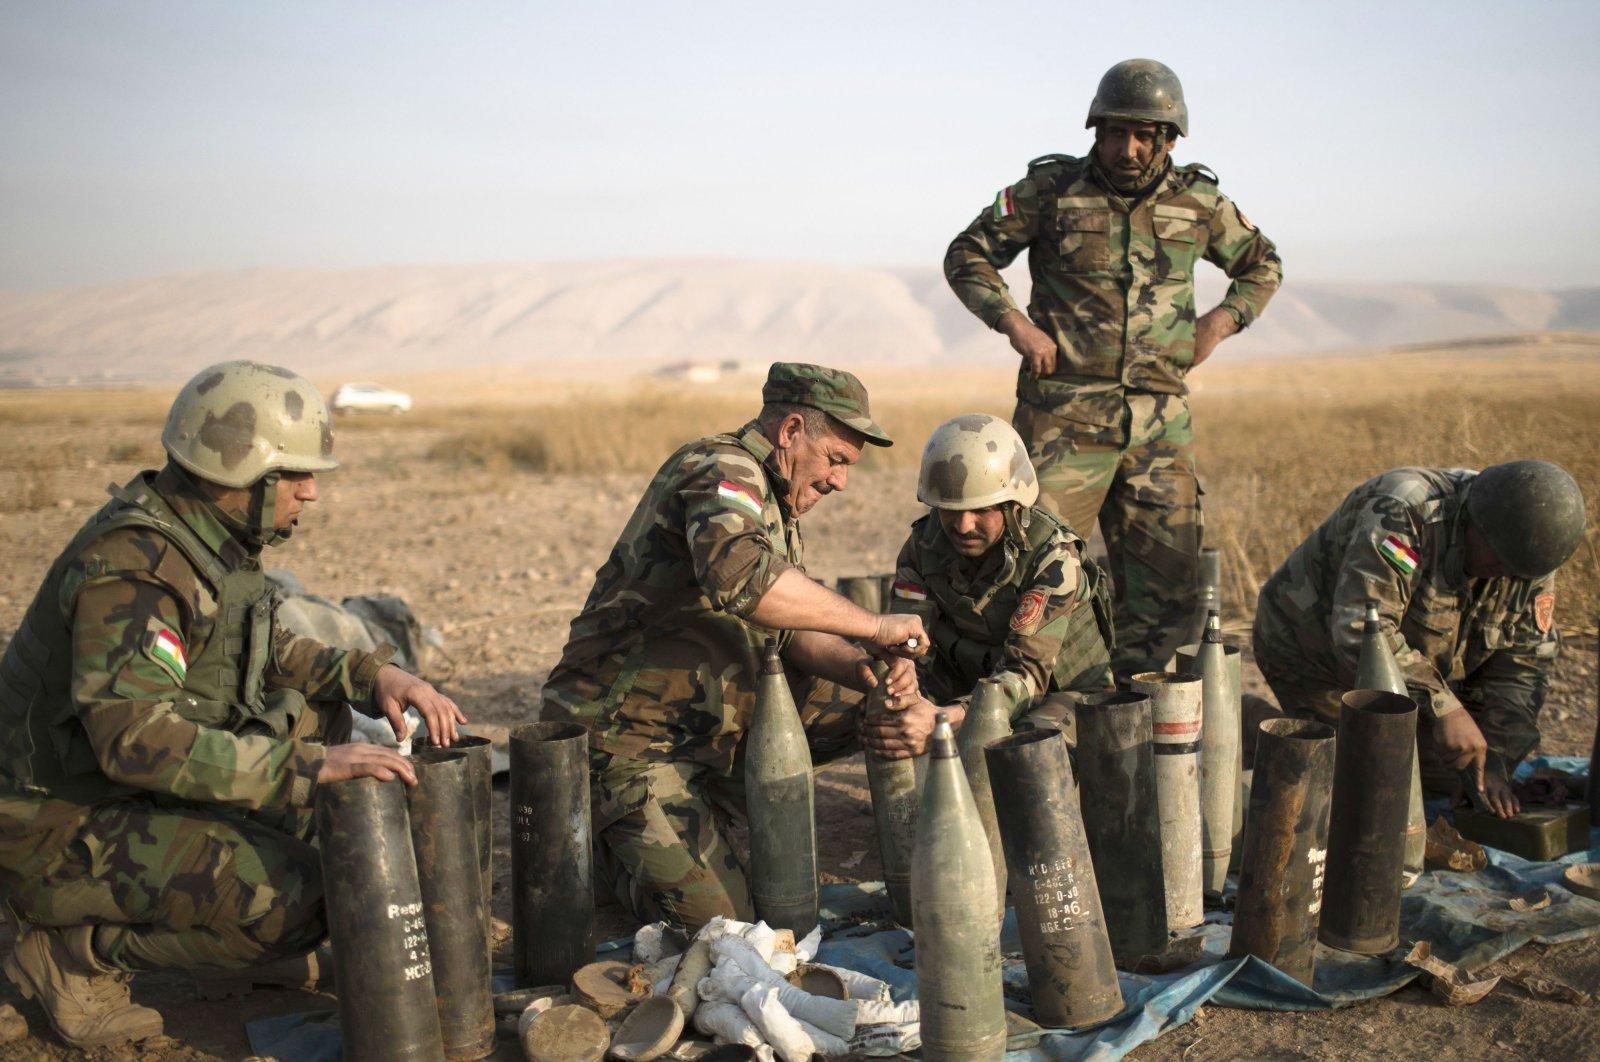 Kurdish Peshmerga prepare to fire artillery at Daesh terrorist positions in Bashiqa, east of Mosul, Iraq, Monday, Nov. 7, 2016. (AP File Photo)